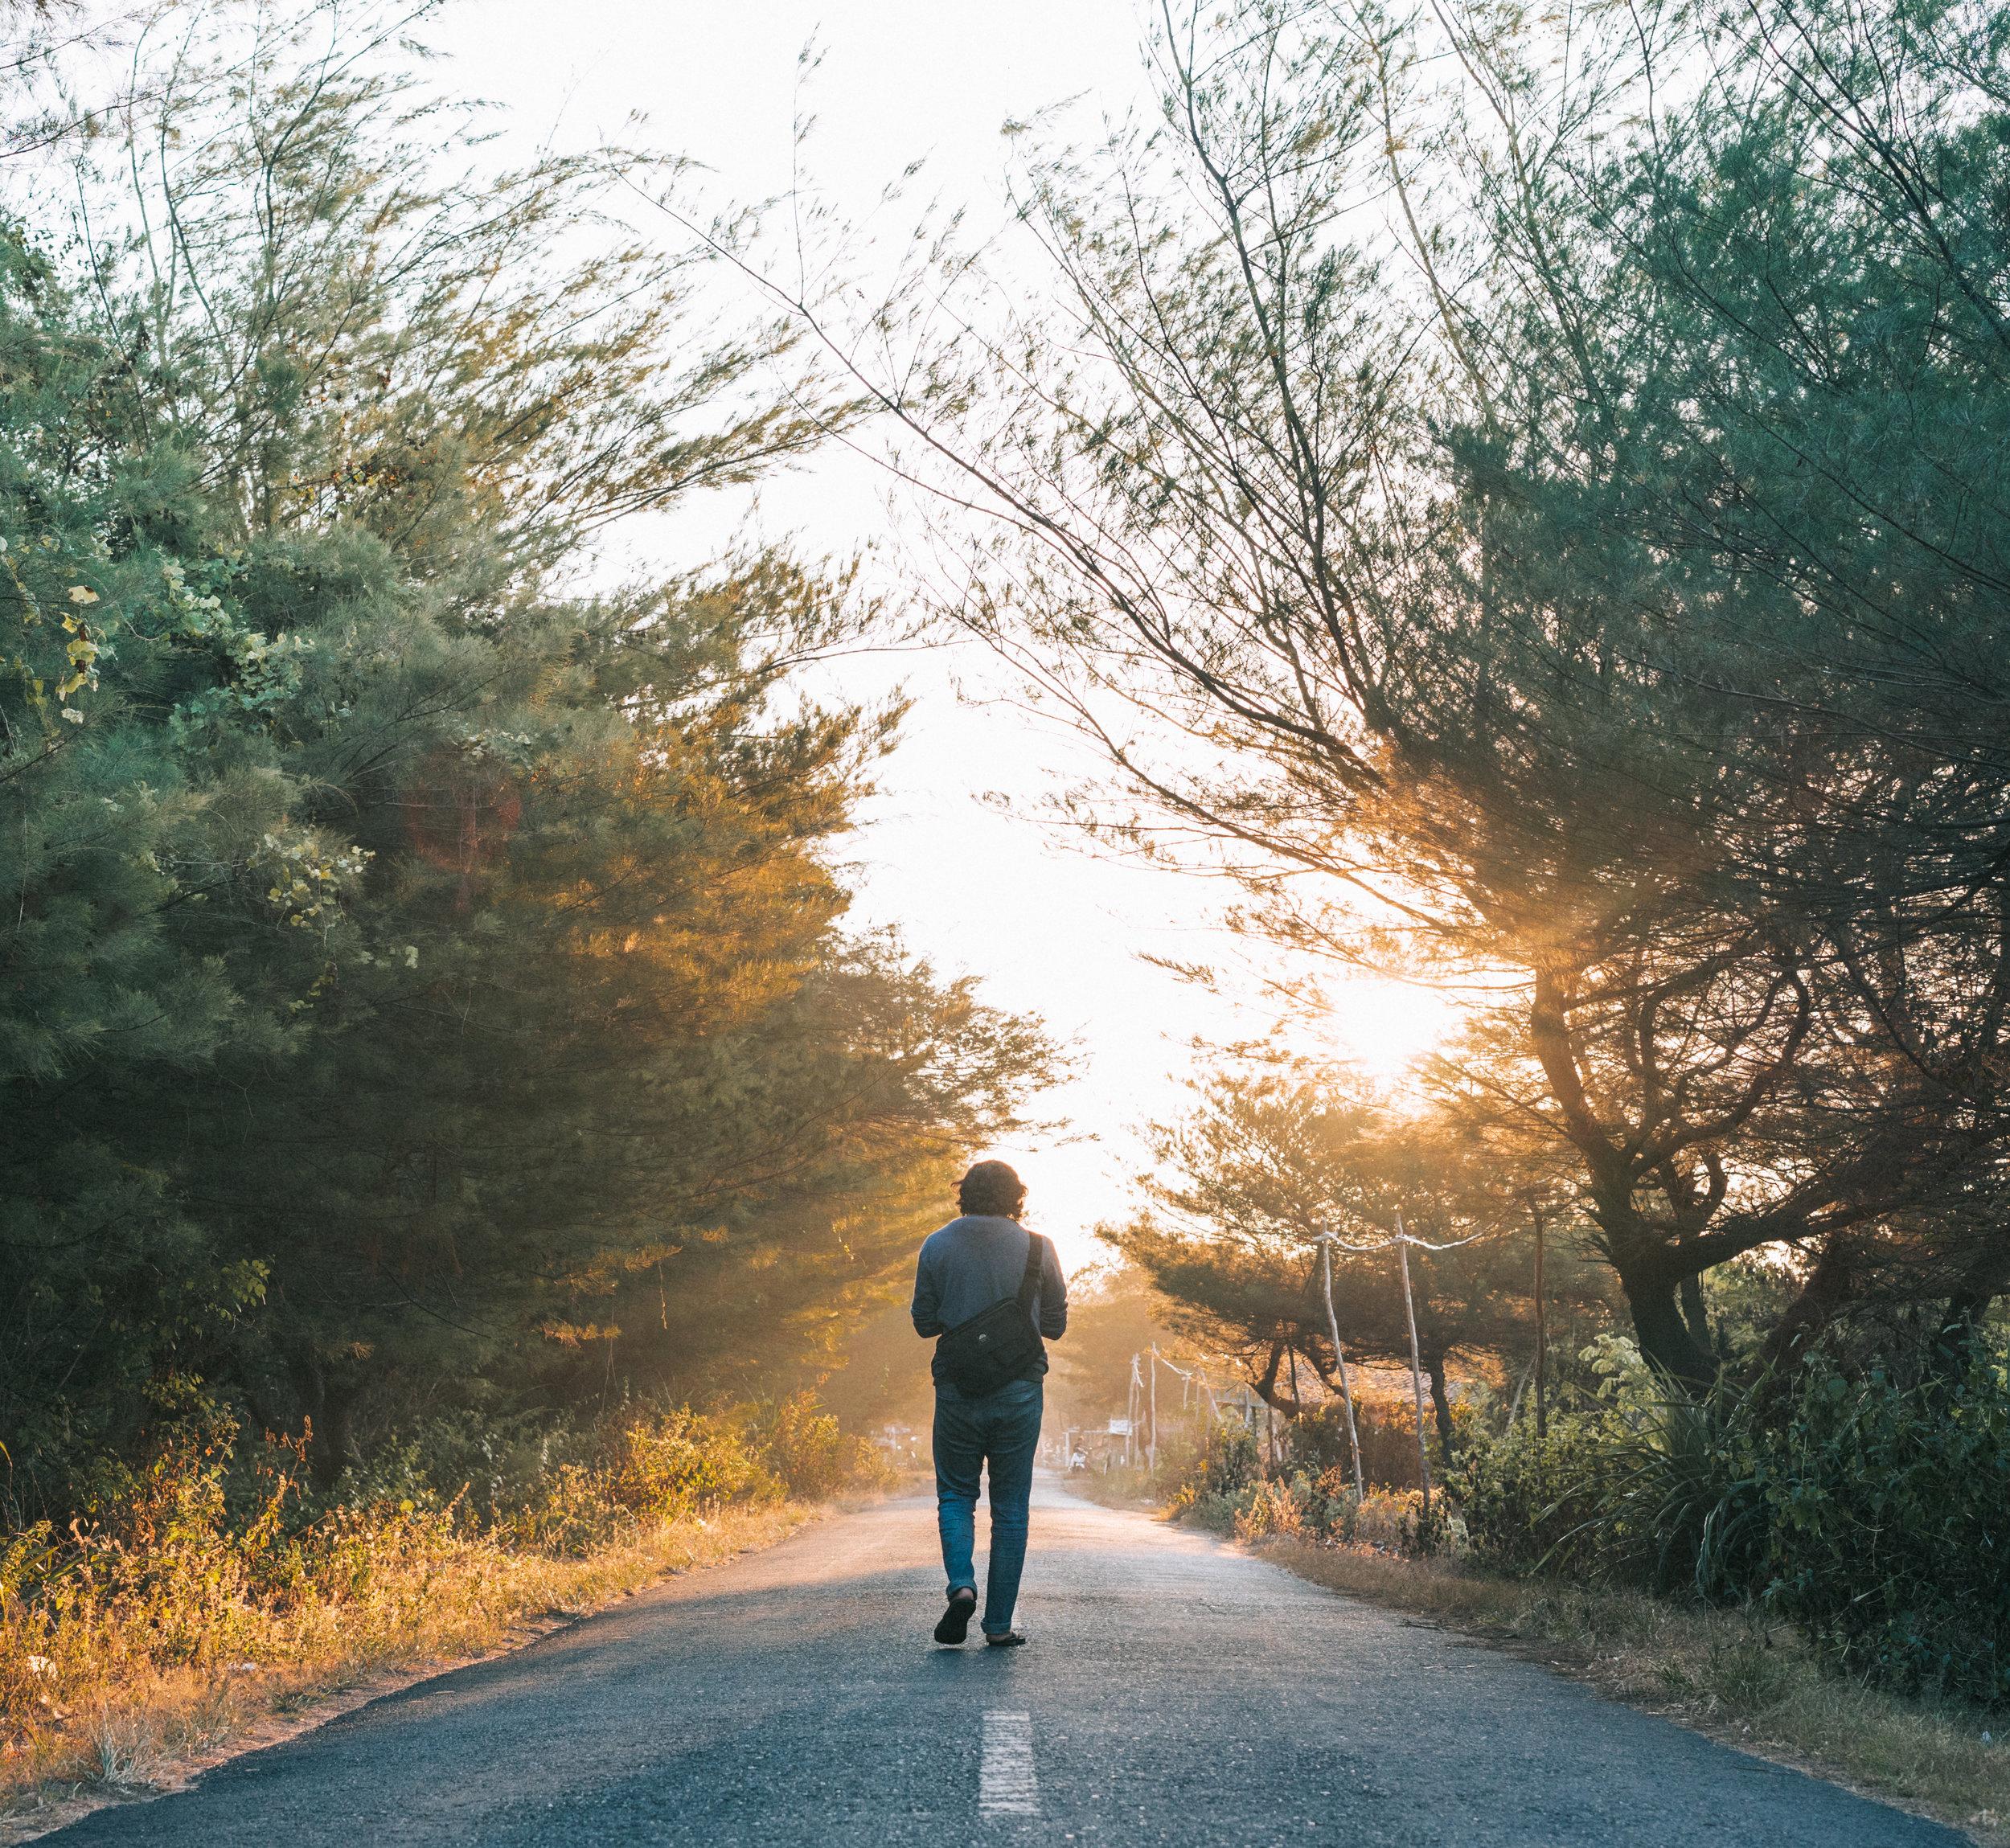 Canva - Man Walking on the Gray Asphalt Road.jpg